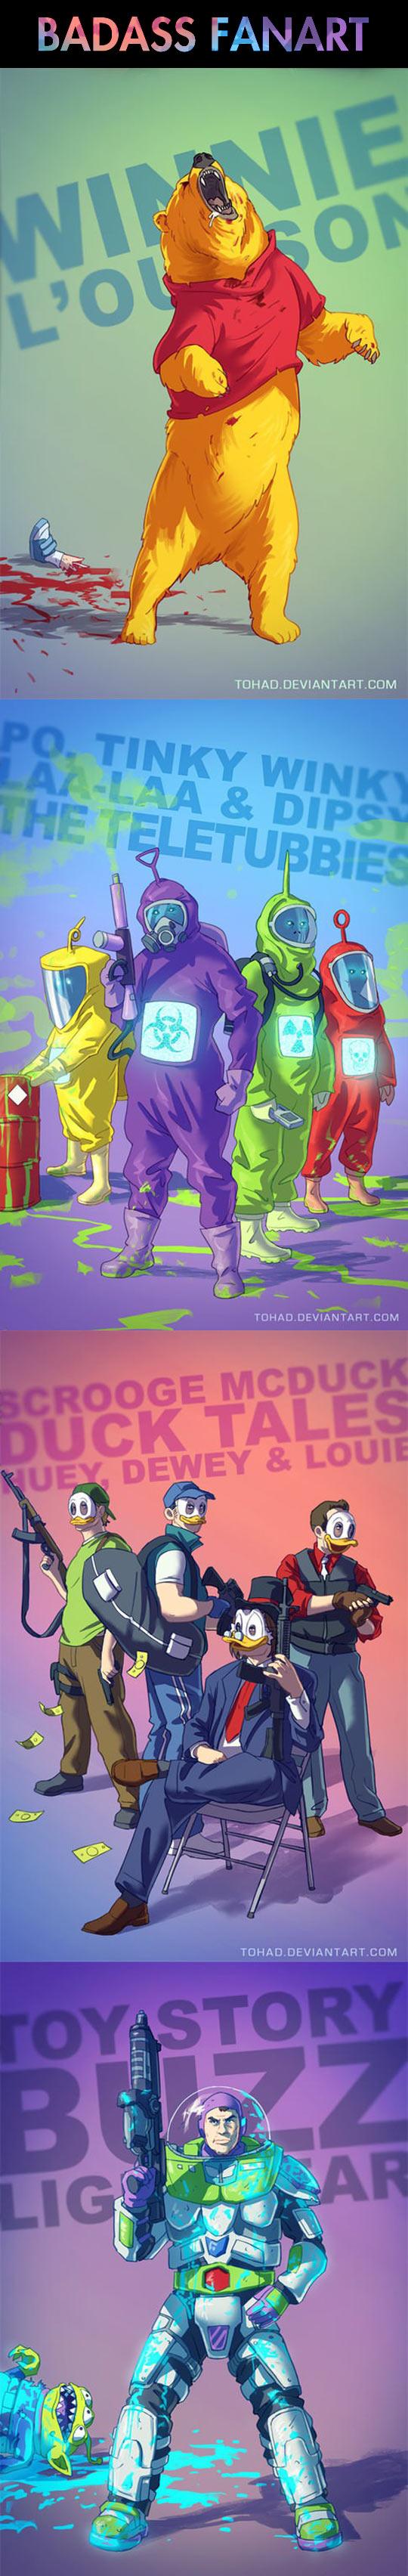 Creative interpretations of animated characters...